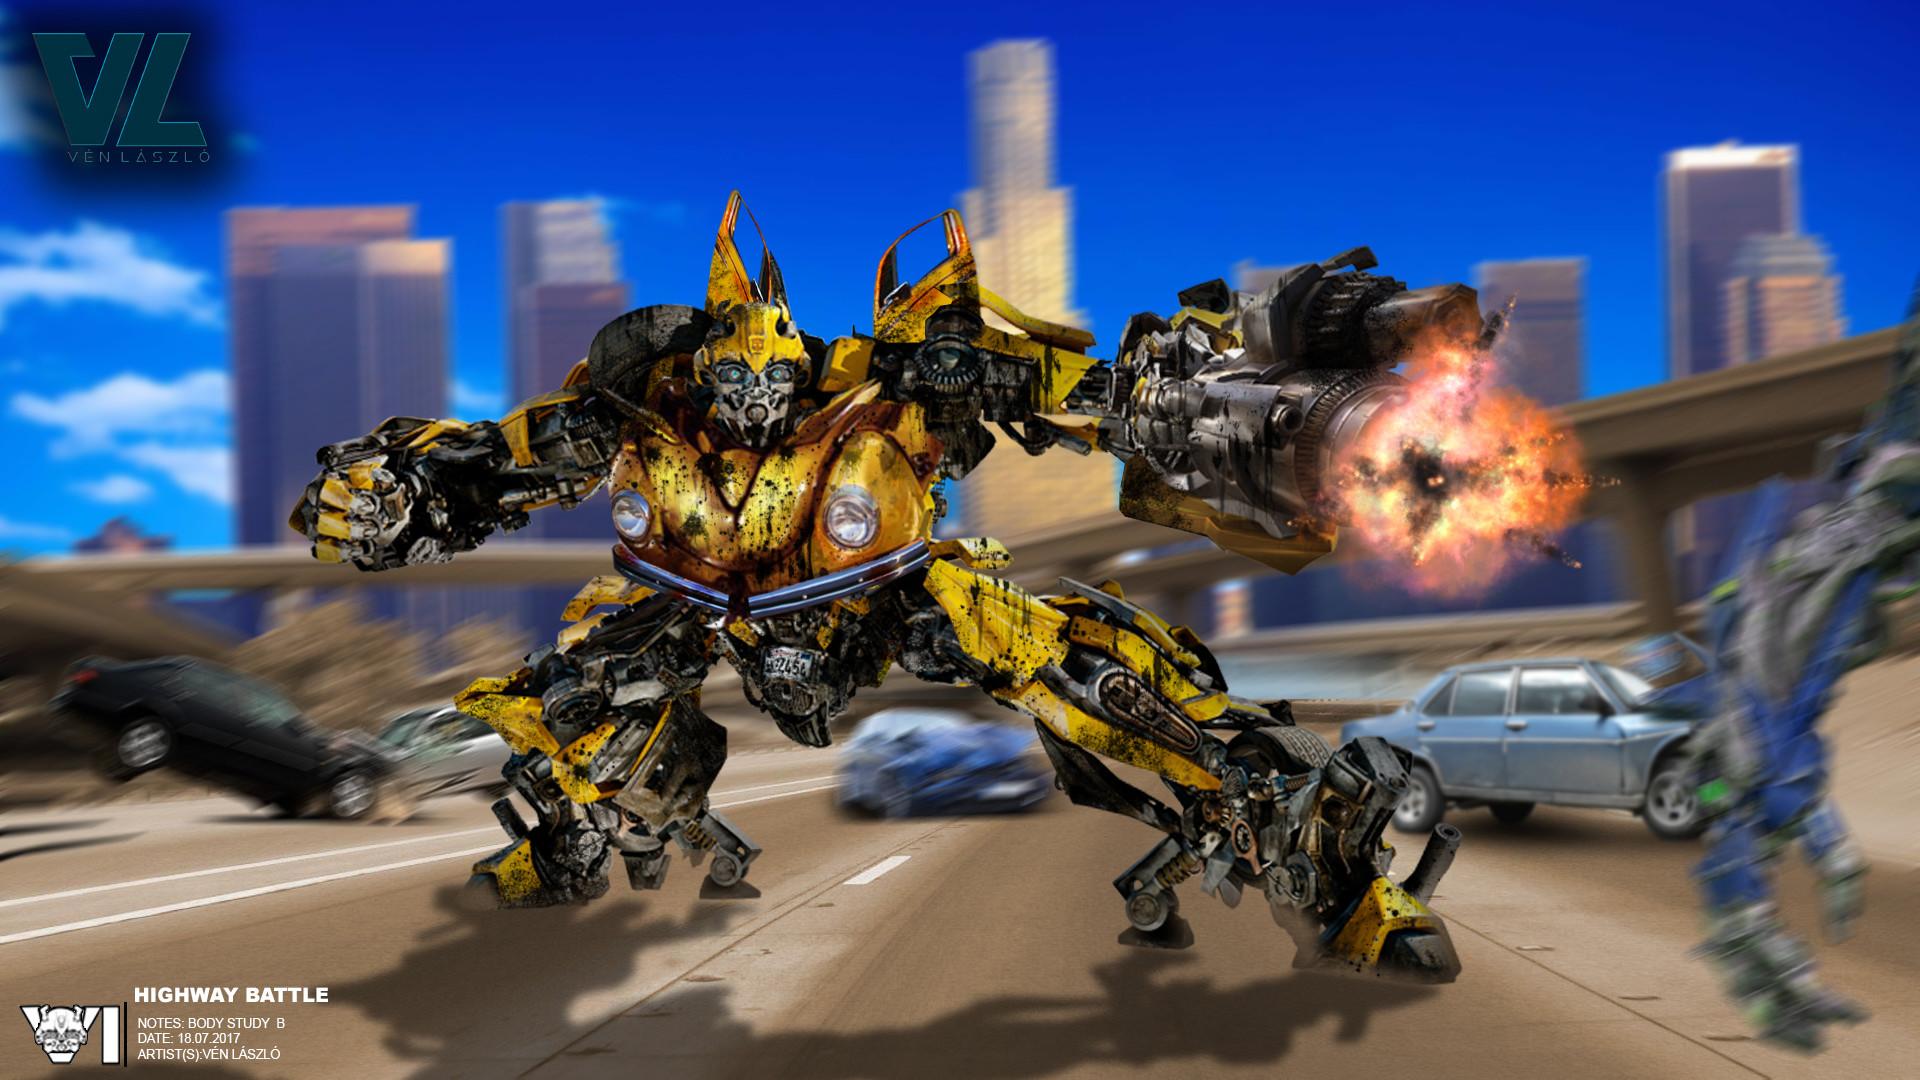 Transformers 5 Concept Art Bumblebee